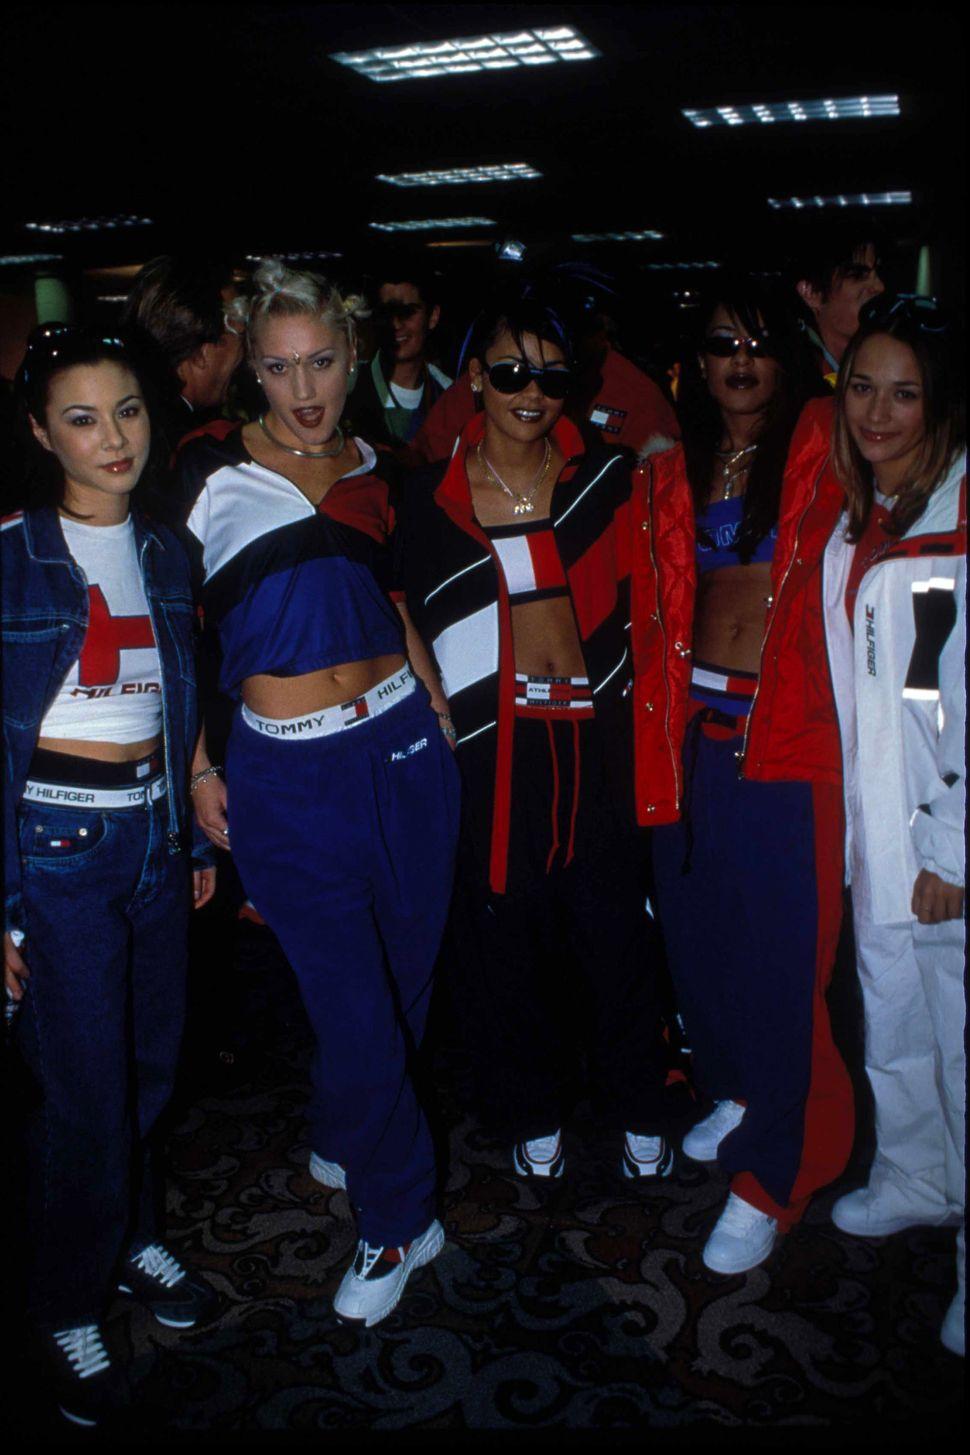 China Chow, Gwen Stefani,Kidada Jones, Aaliyah and Rashida Jones photographed by Patrick McMullan in New York City, 199